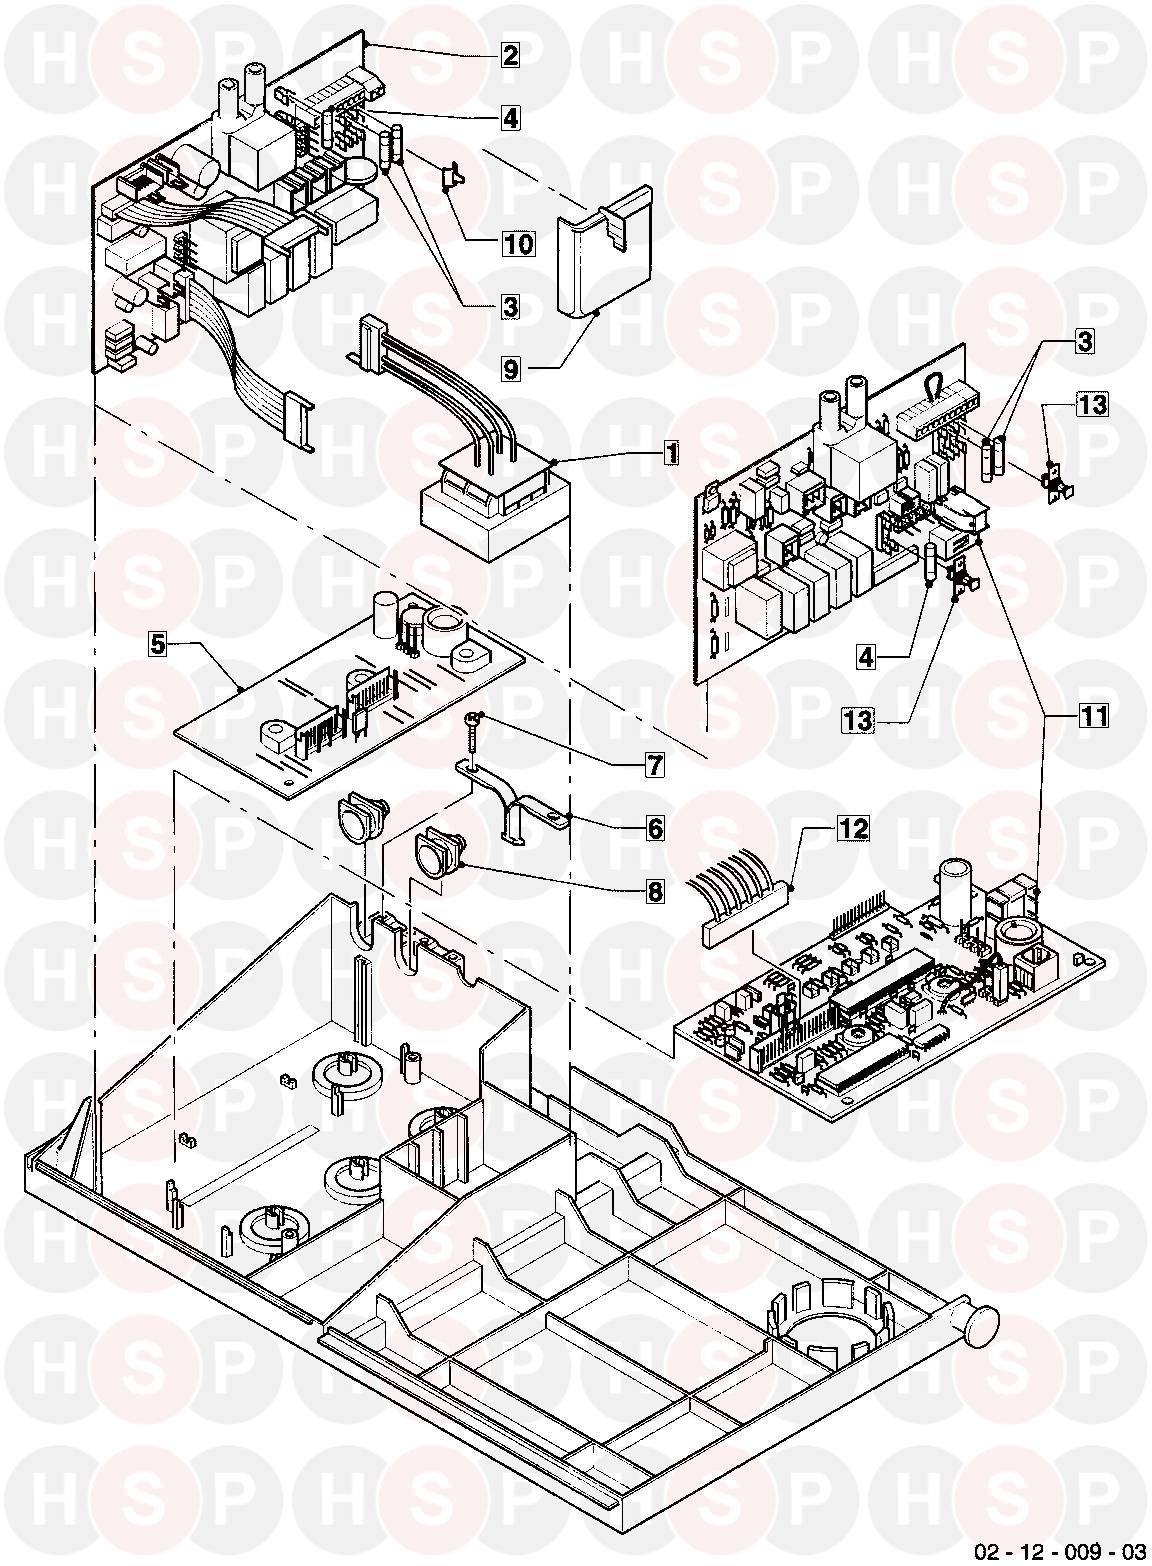 Vaillant TURBOMAX VUW 282/1E 1998-2001 (12A CONTROL BOX